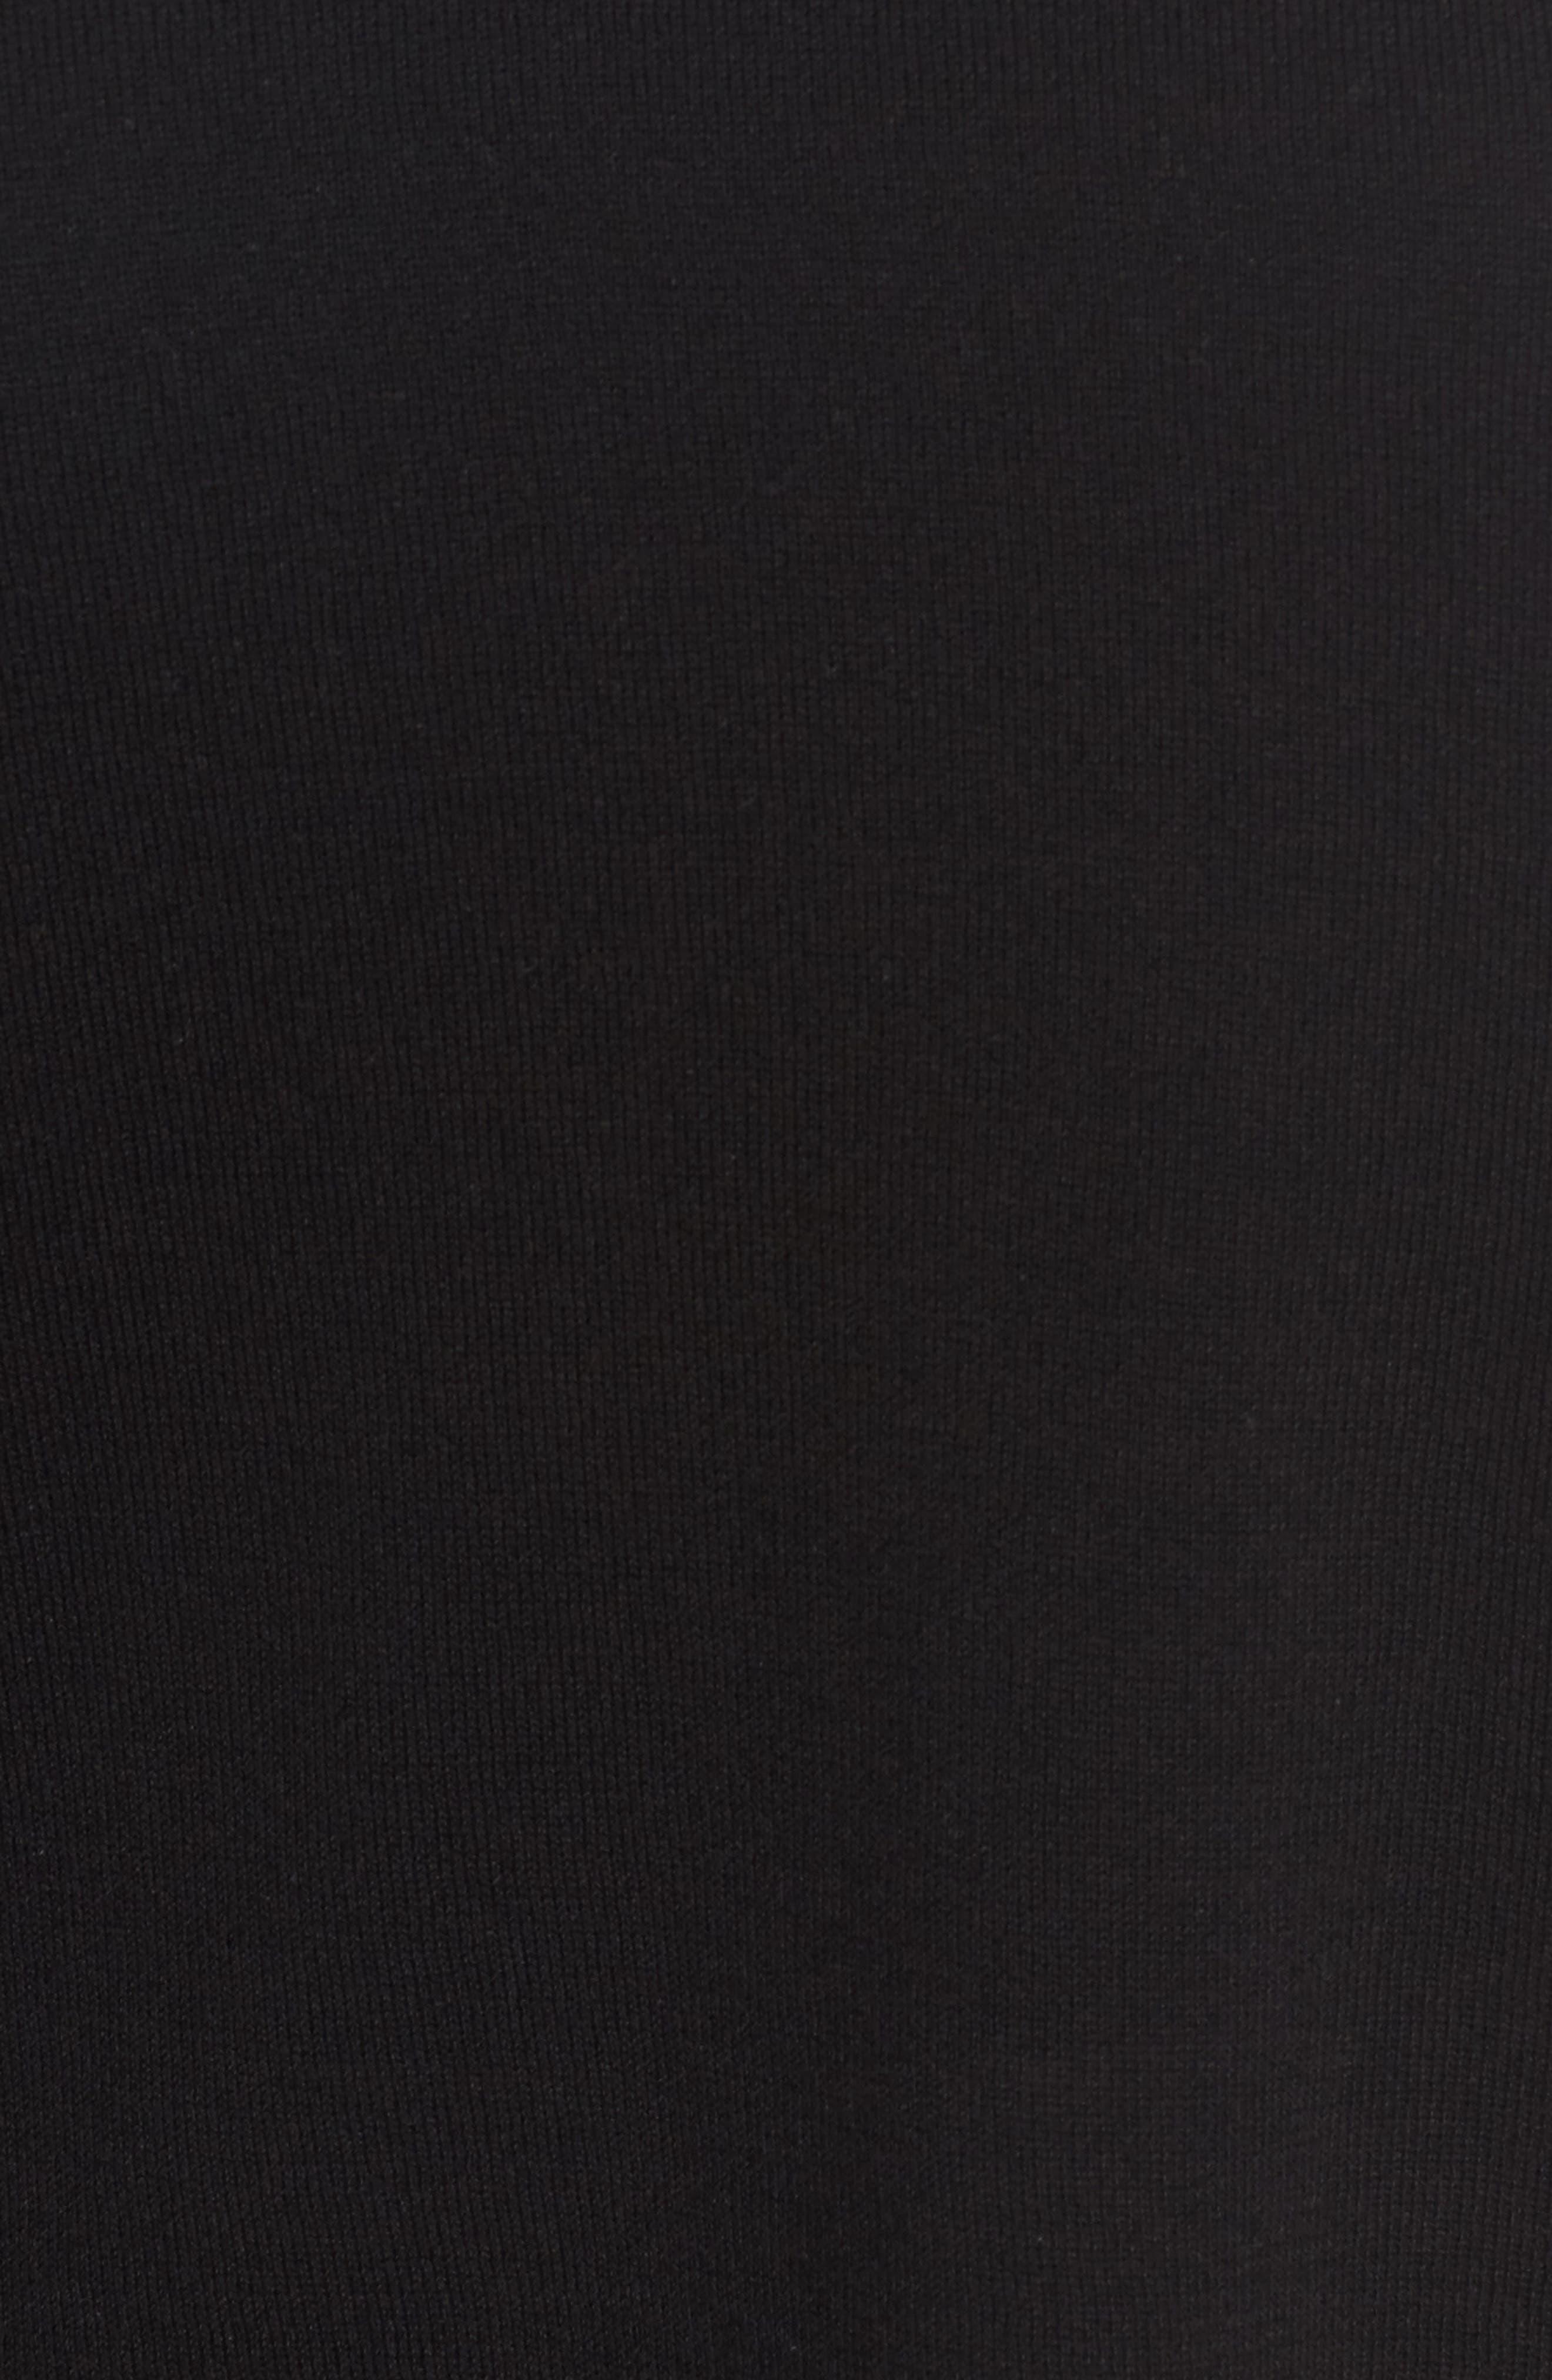 Tencel<sup>®</sup> Knit Dolman Top,                             Alternate thumbnail 5, color,                             001